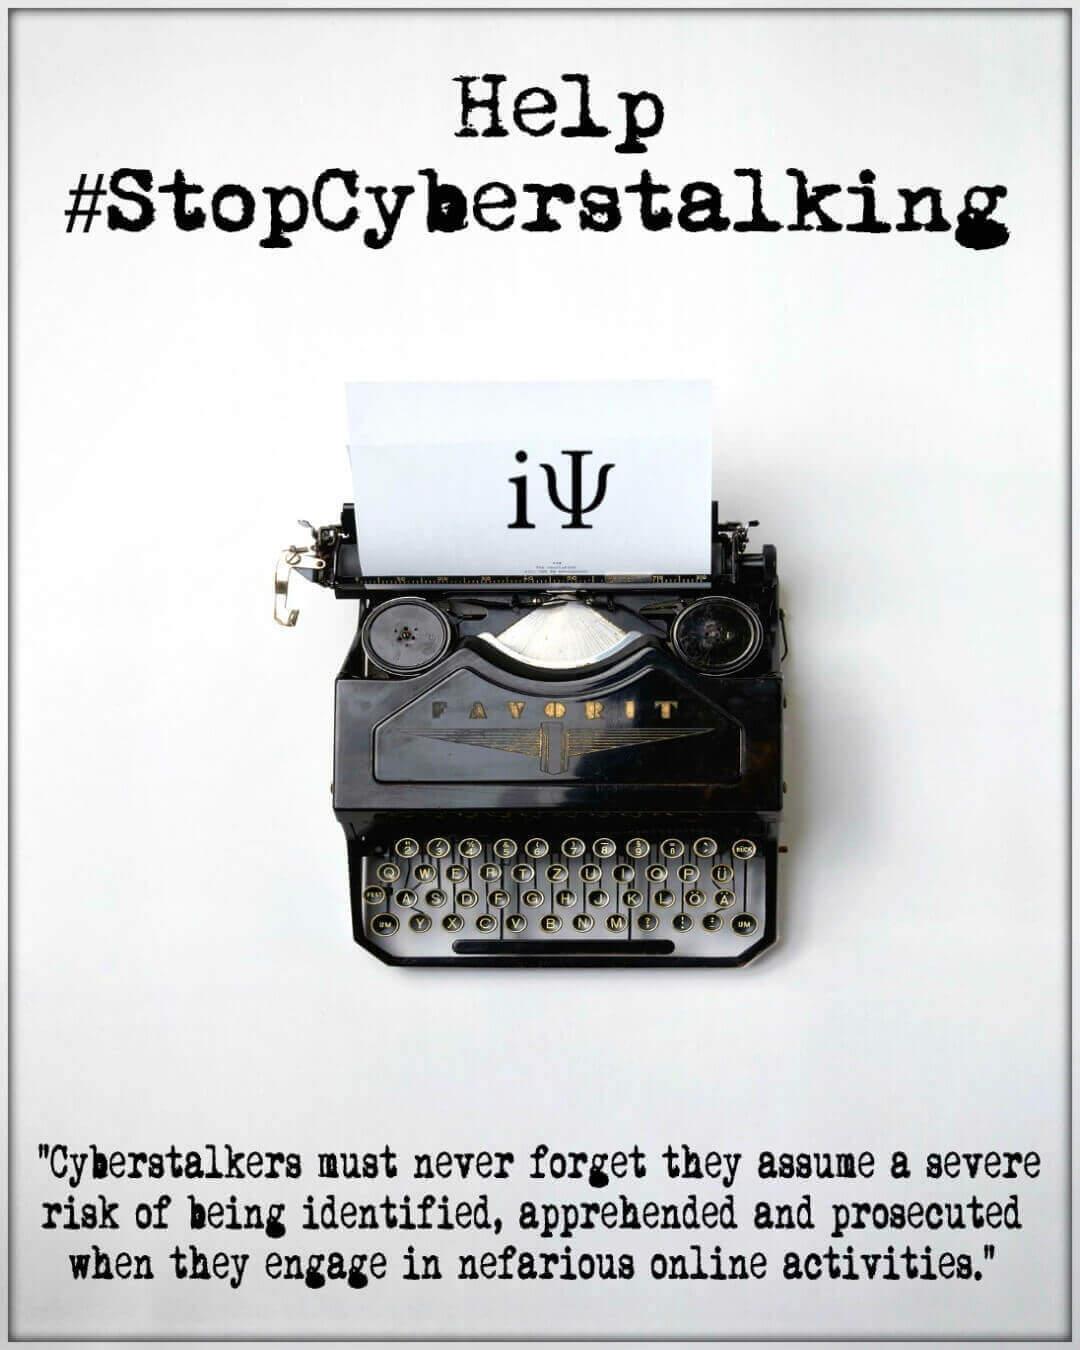 michael-nuccitelli-ipredator-cyberstalking-4